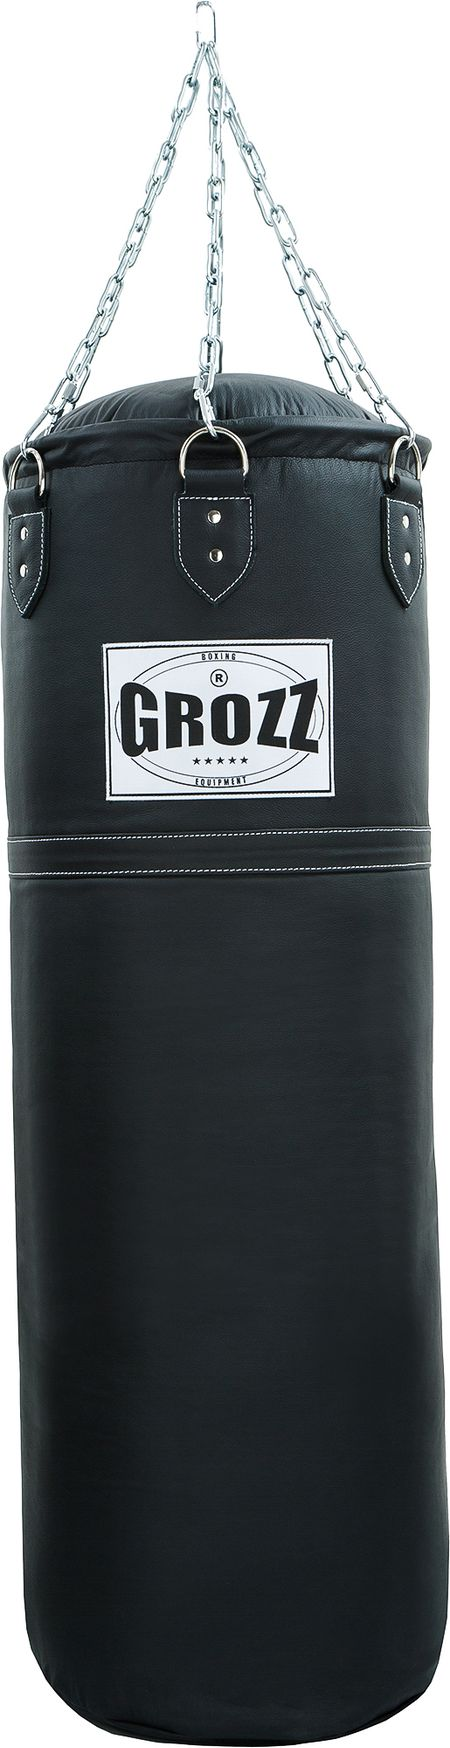 Grozz Мешок набивной Grozz, 60 кг